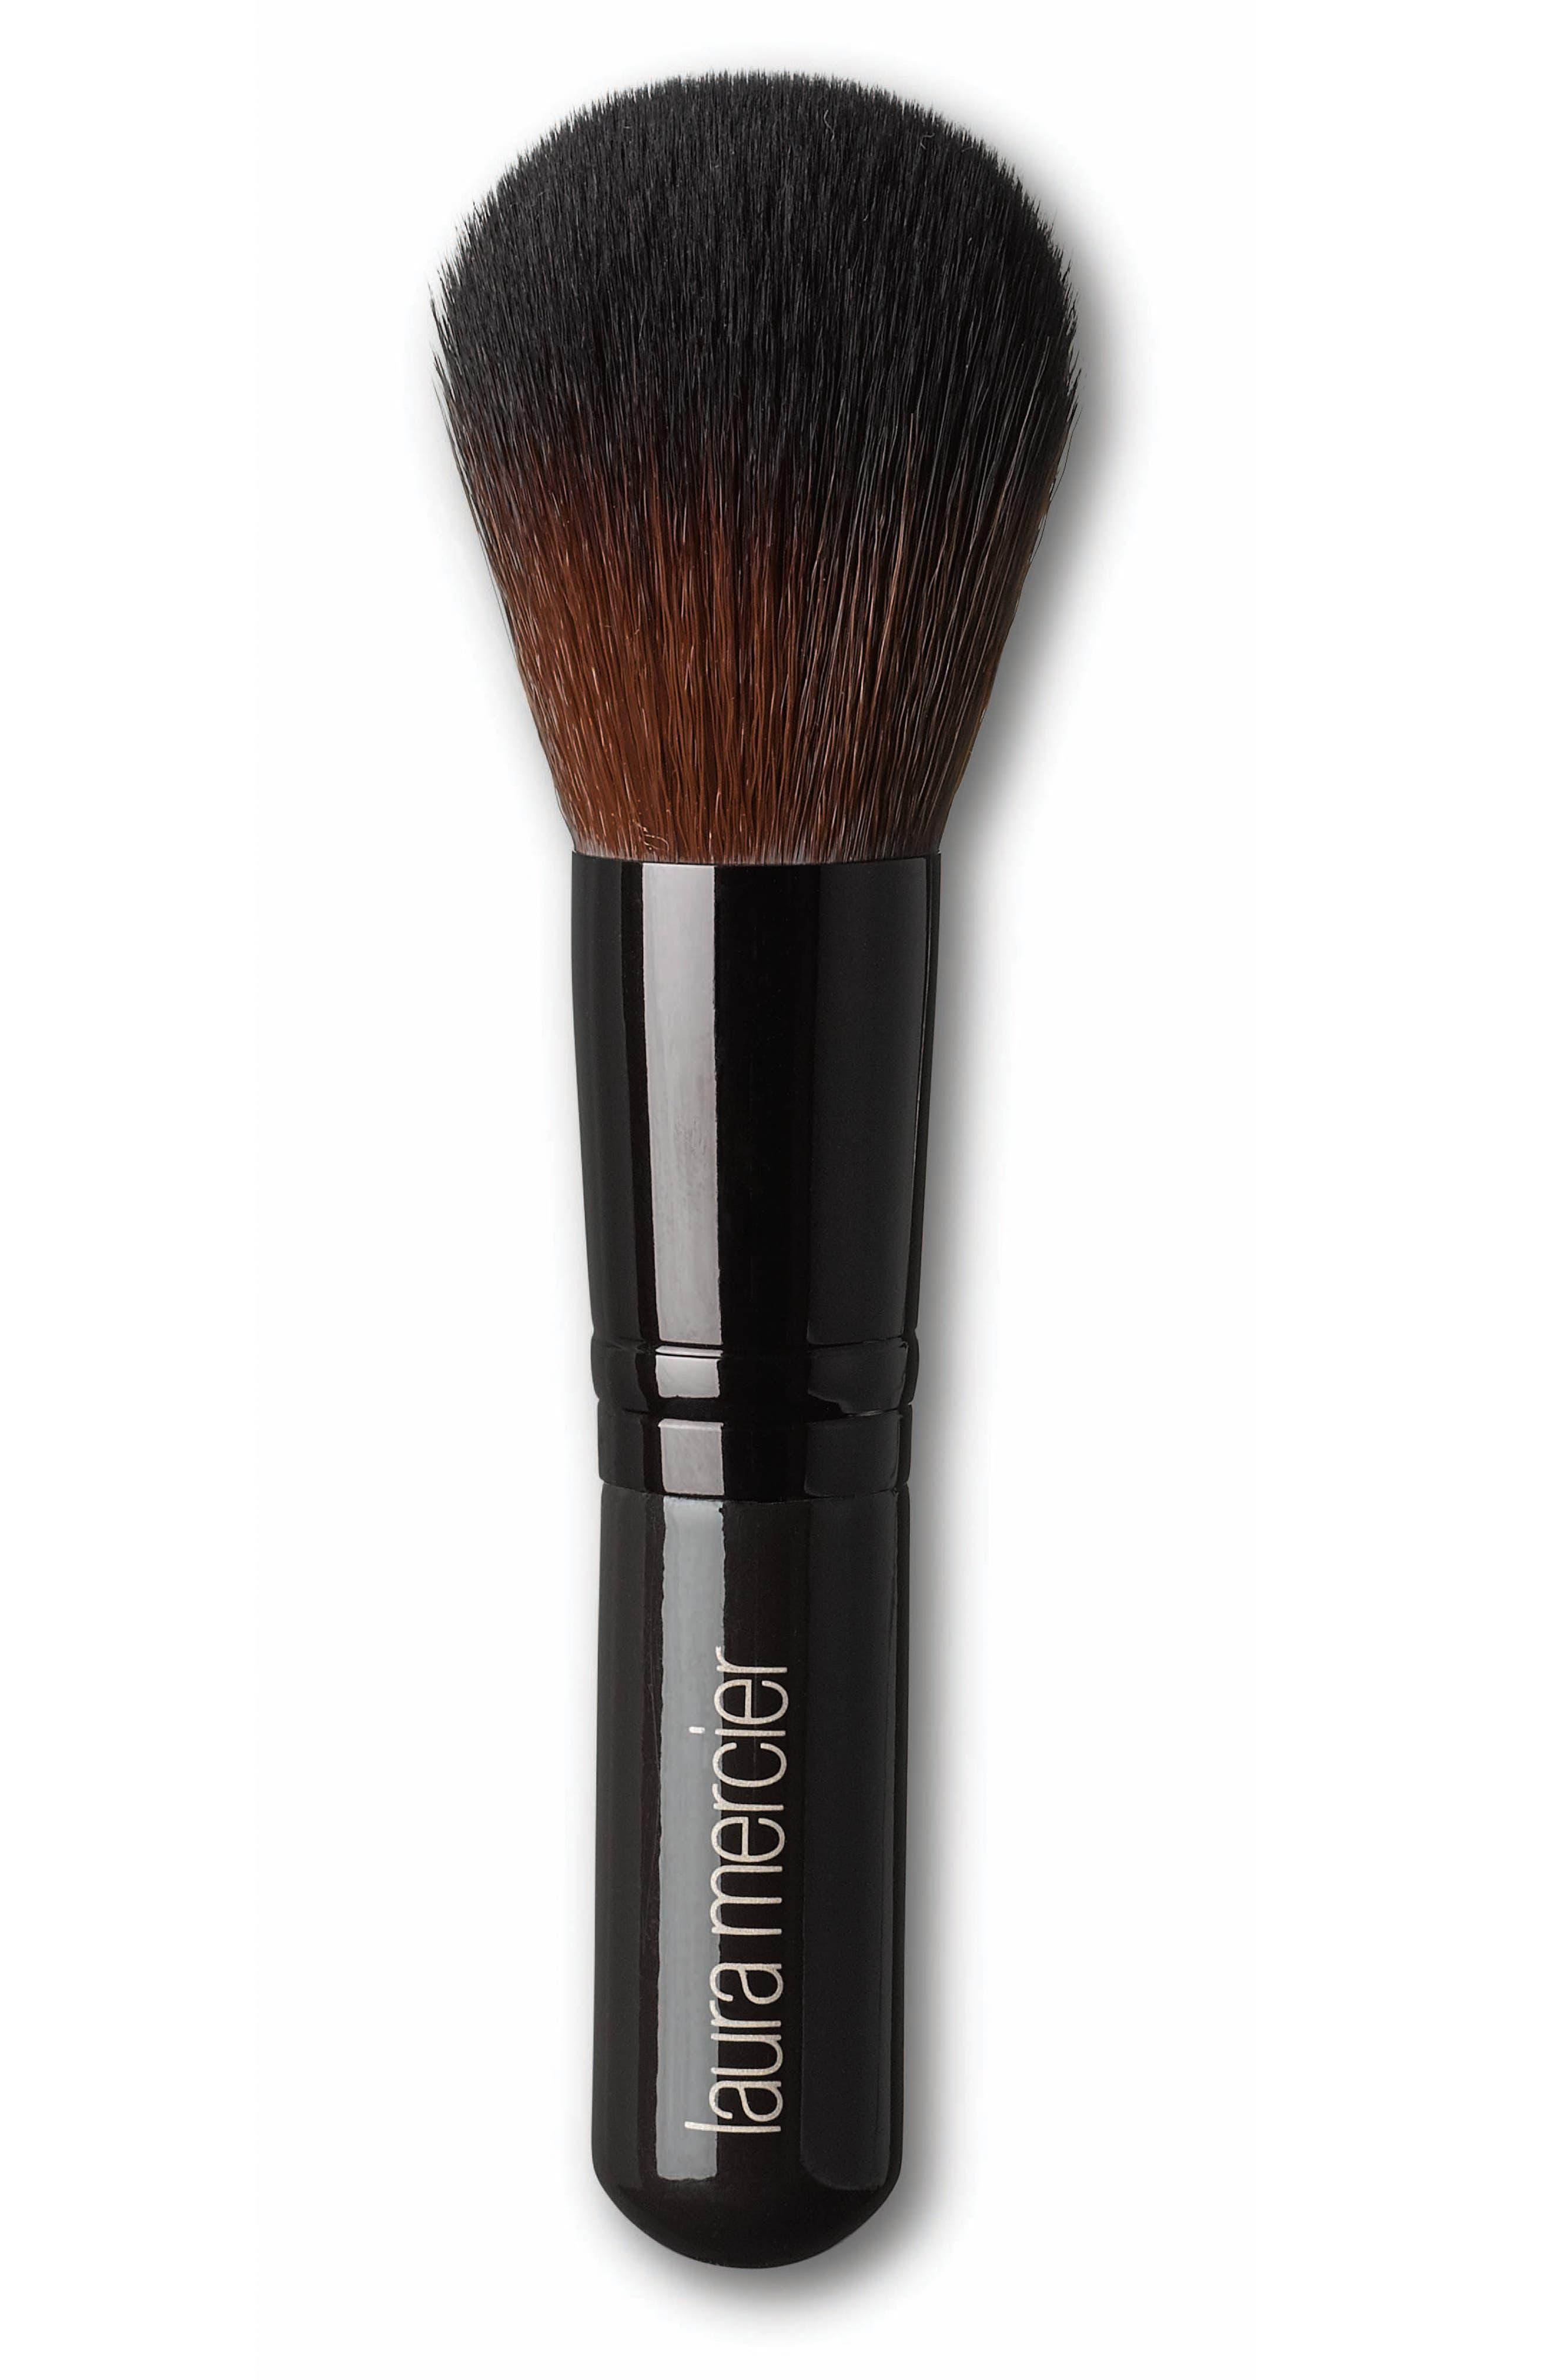 Blending Brush,                         Main,                         color, No Color